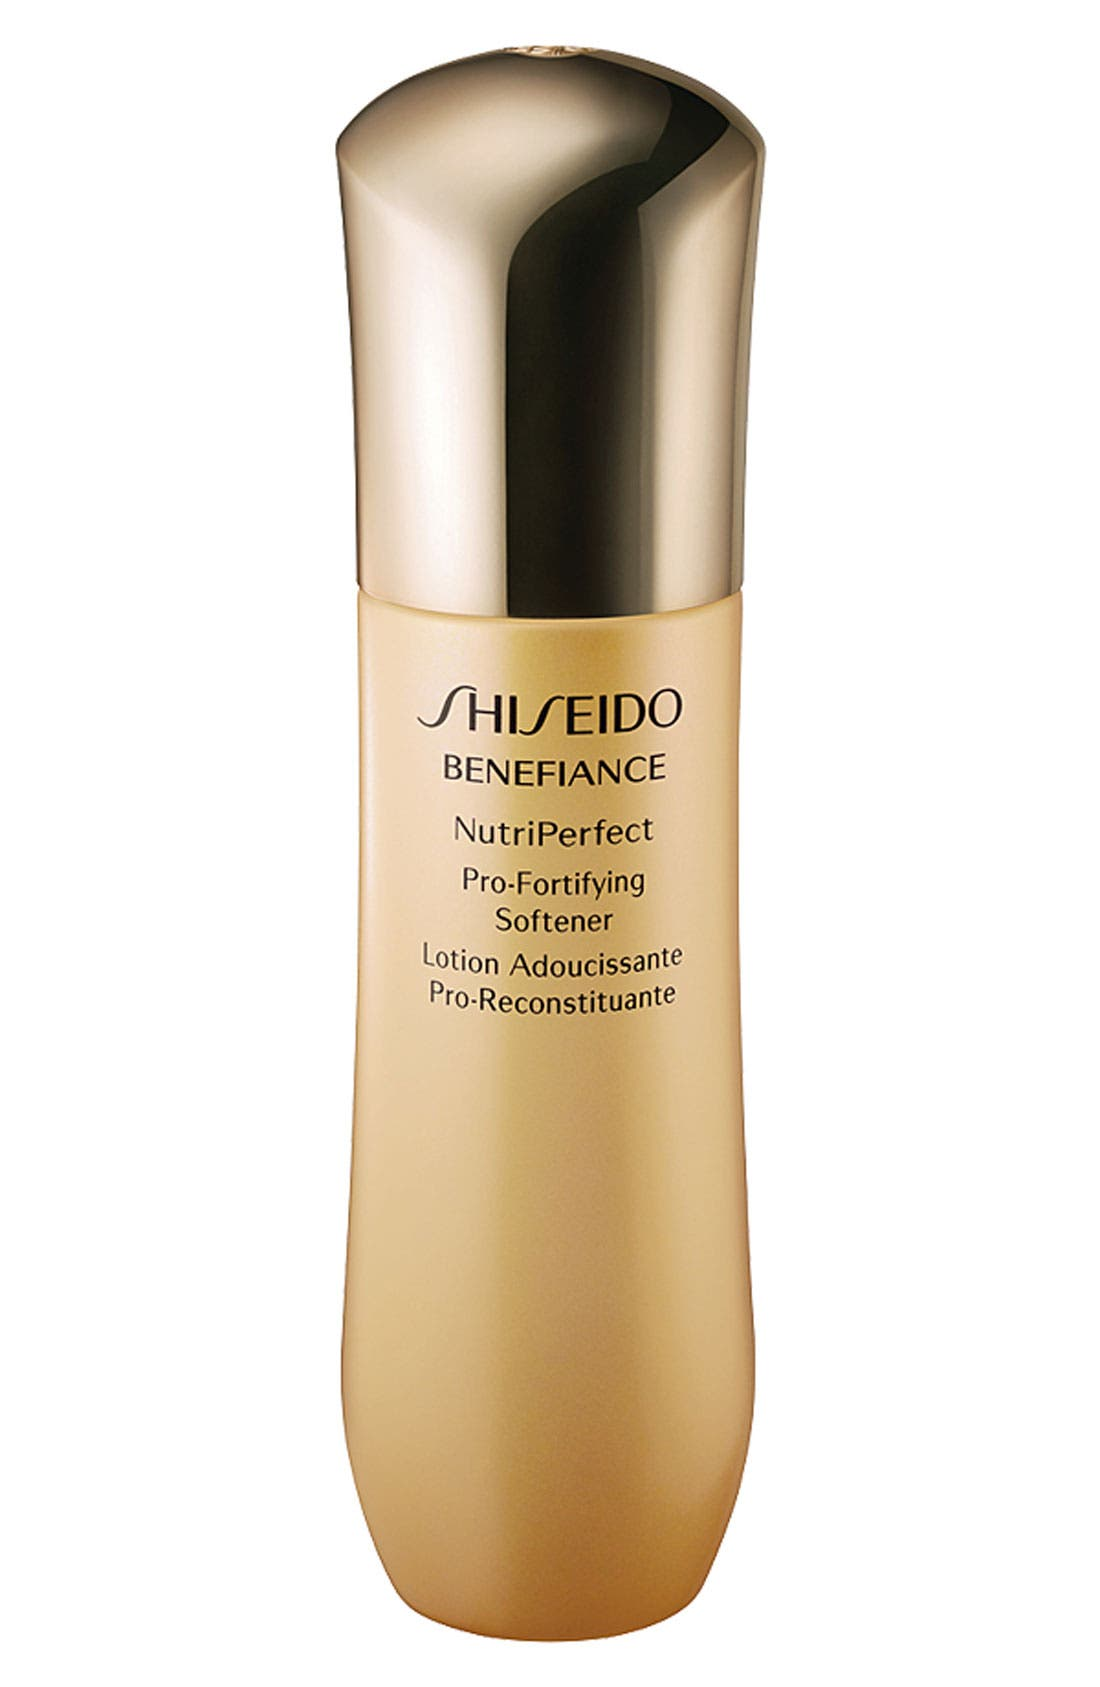 Shiseido 'Benefiance NutriPerfect' Pro-Fortifying Softener